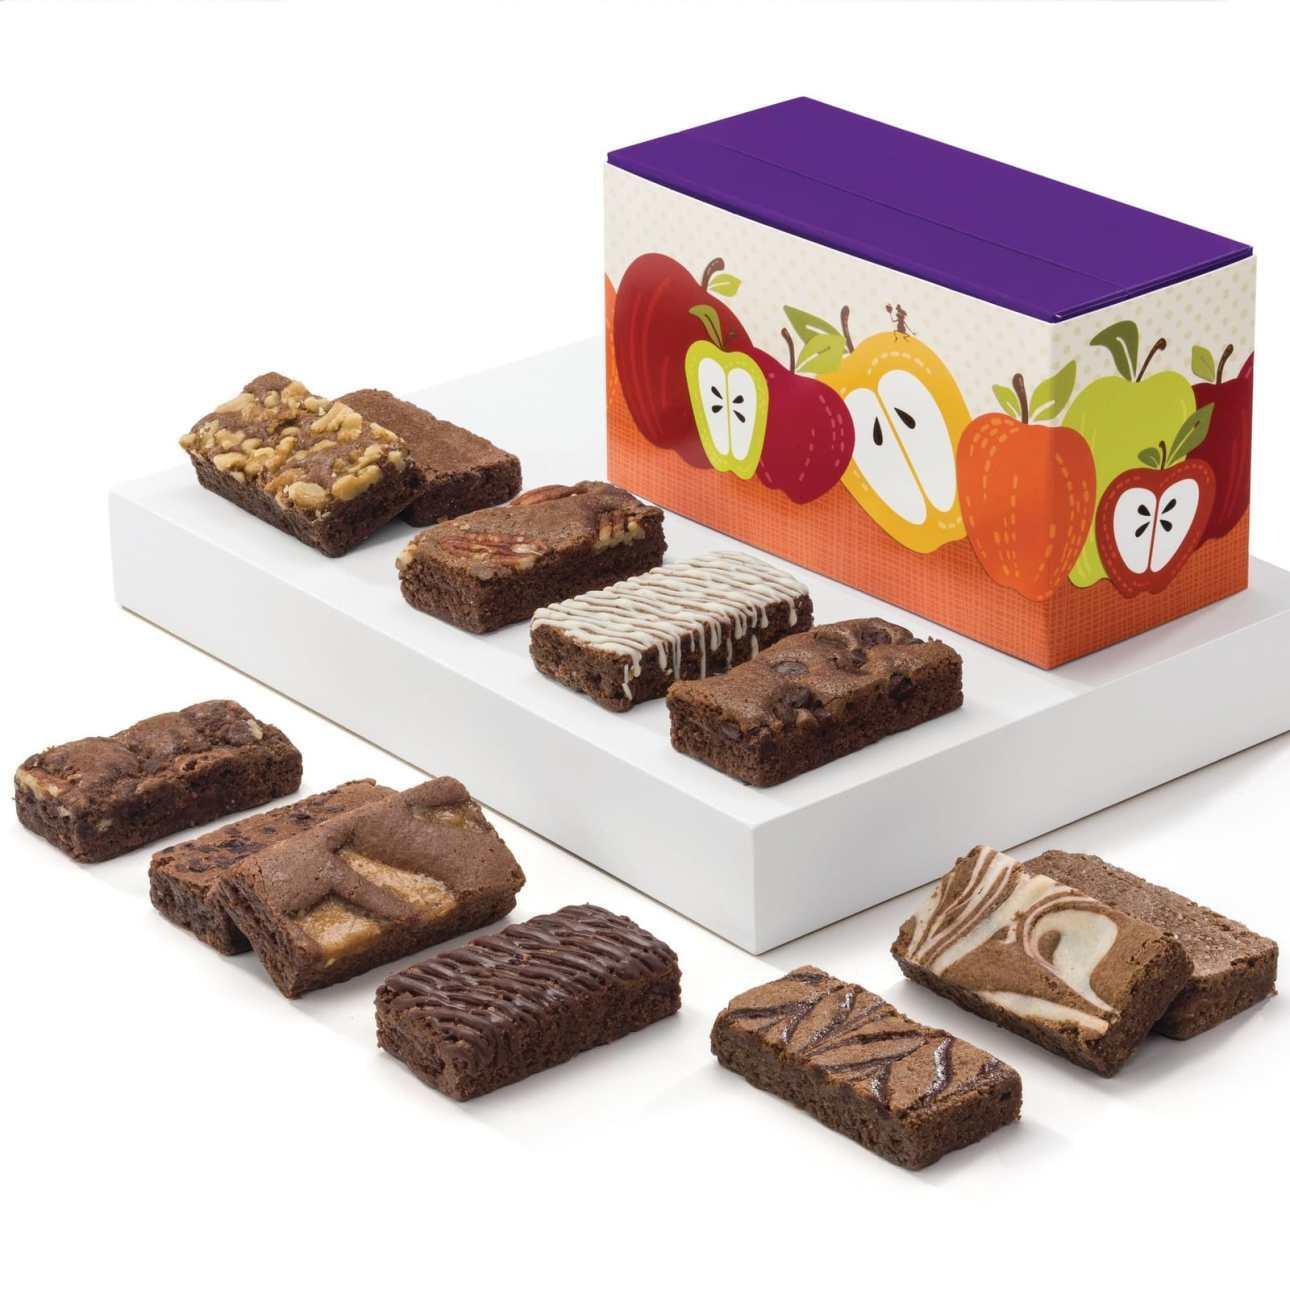 Fall Sprite Dozen Fairytale Brownies 12 total pieces 12 Fairytale Sprites: 1 Caramel, 1 Chocolate Chip, 1 Mint Chocolate, 1 Original, 1 Pecan, 1 Raspberry Swirl, 1 Toffee Crunch, 1 Walnut, 1 White Chocolate, 1 Espresso Nib, 1 Cream Cheese, 1 Cinnamon Cocoa